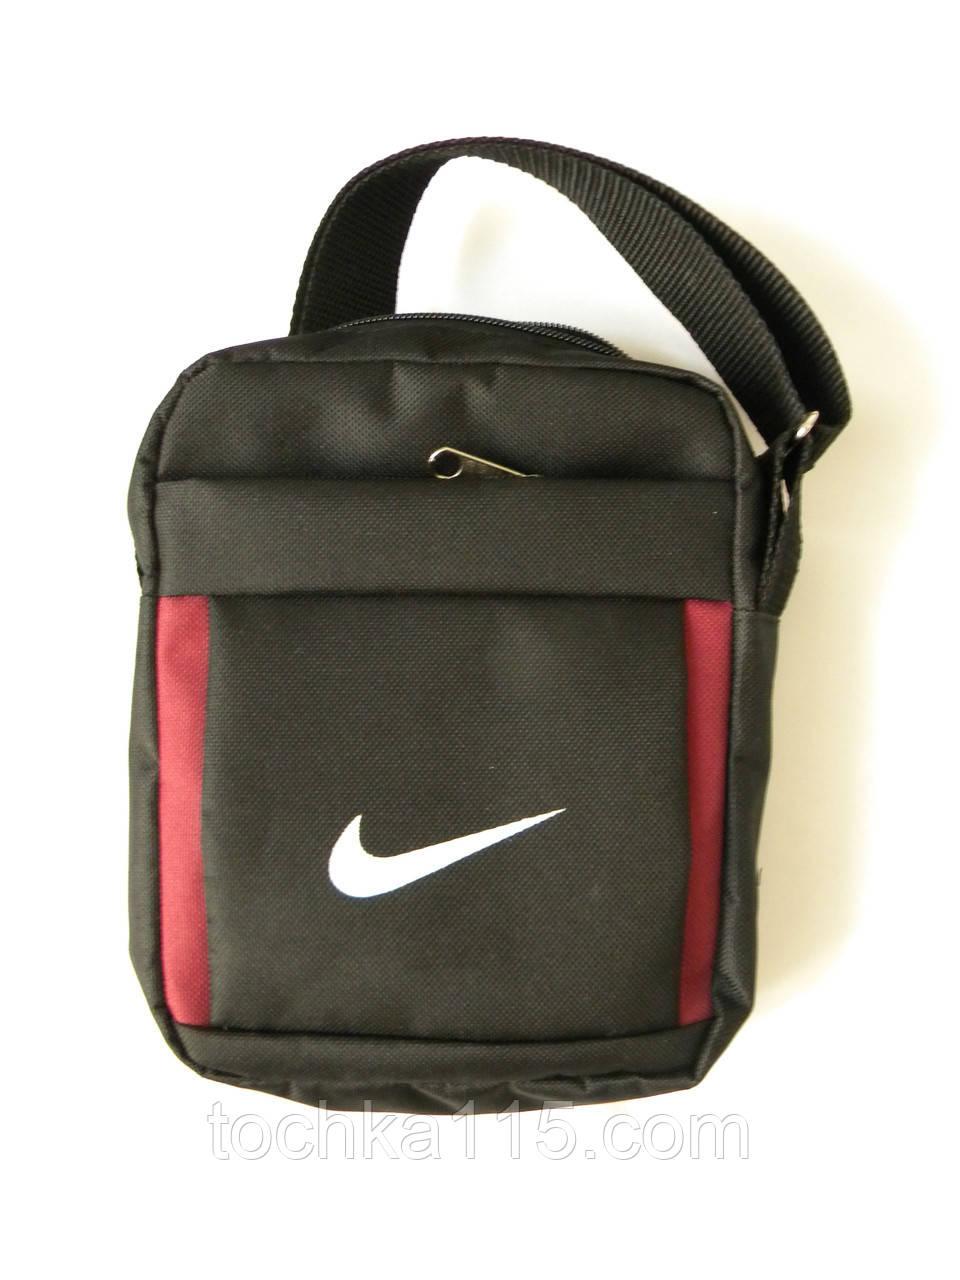 Мужская сумка через плече Nike, чоловiчi сумки Найк, молодежная сумка через плече, сумка для документов   реплика - Точка 115 в Николаевской области